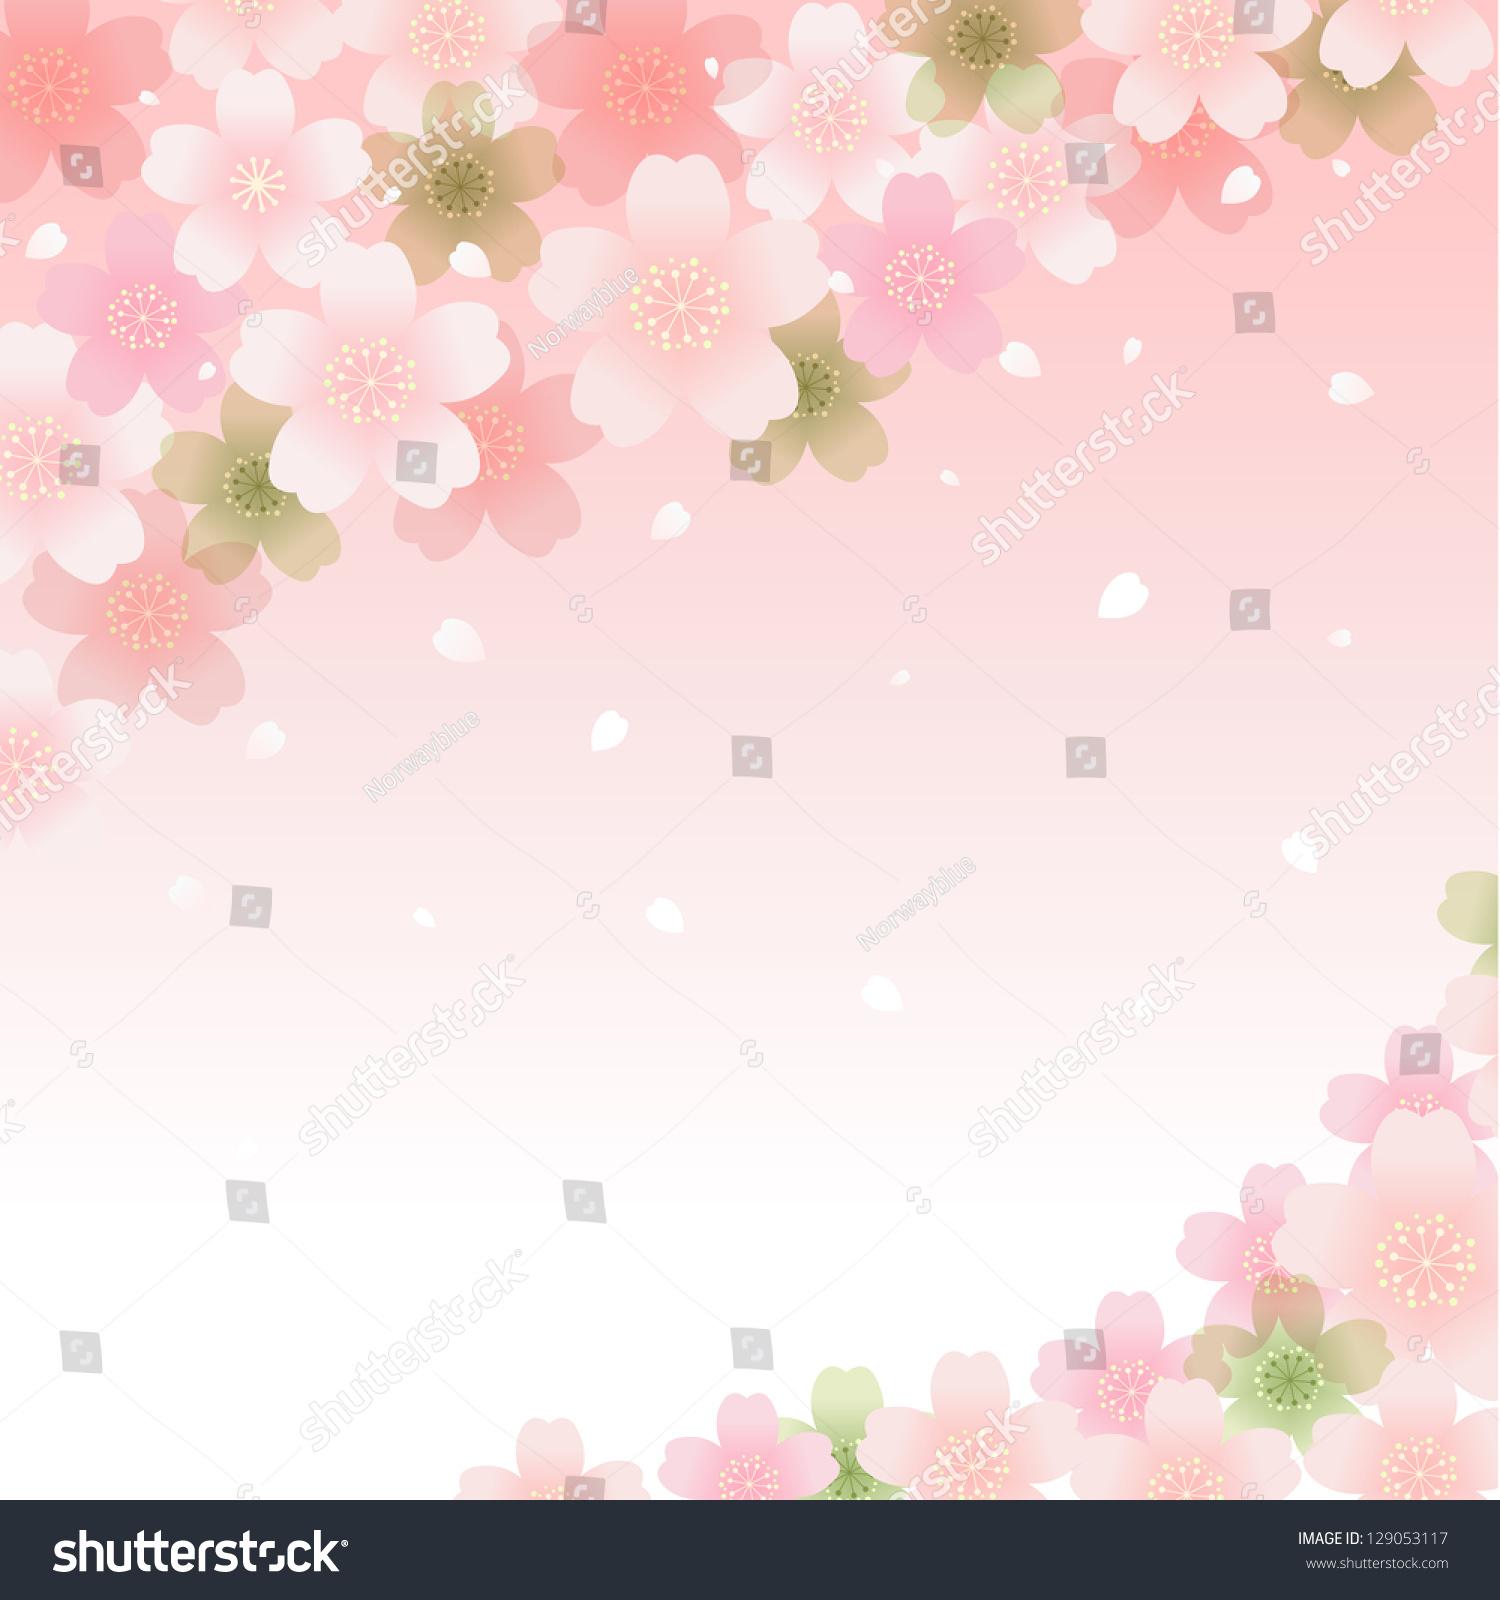 Background image transparency - Sakura Cherry Blossom Background Transparency Gradients Clipping Mask Is Used Eps10